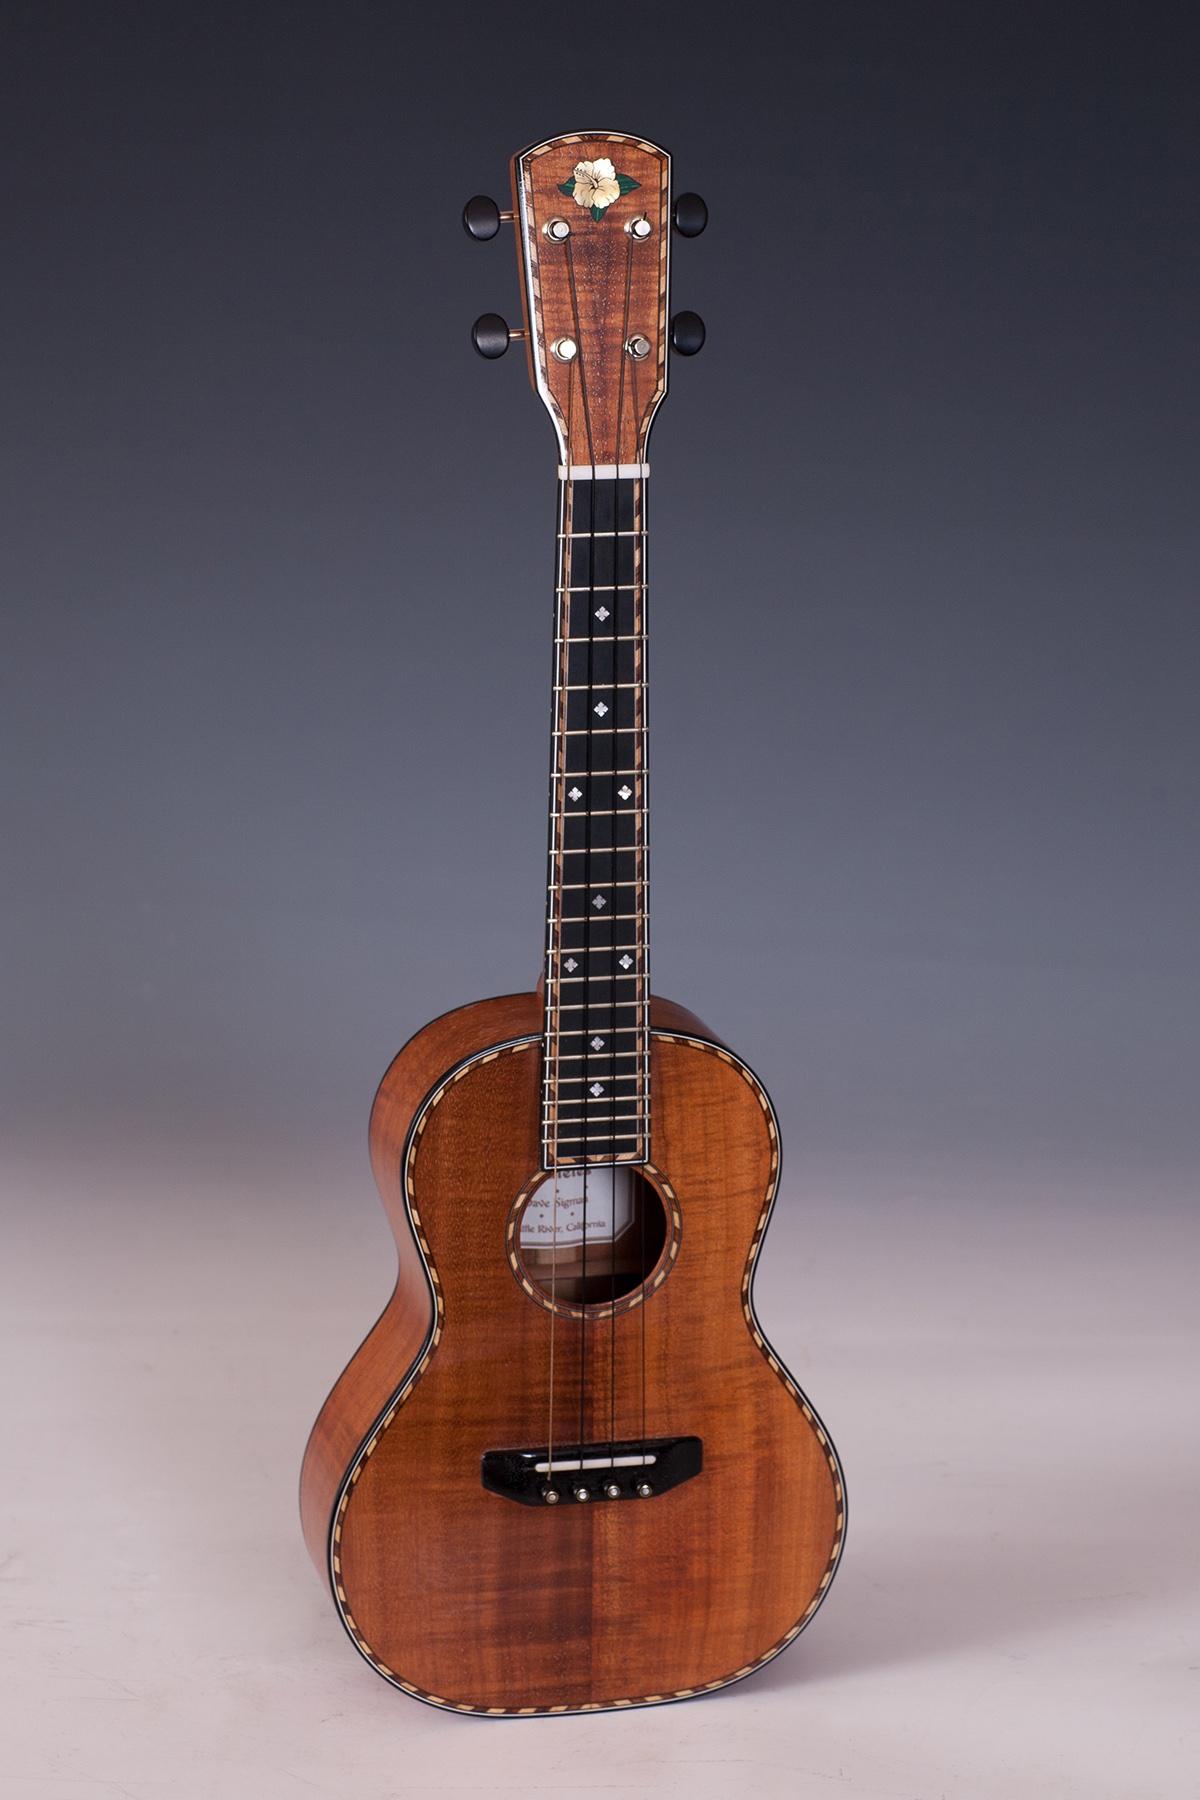 little river sporano ukulele